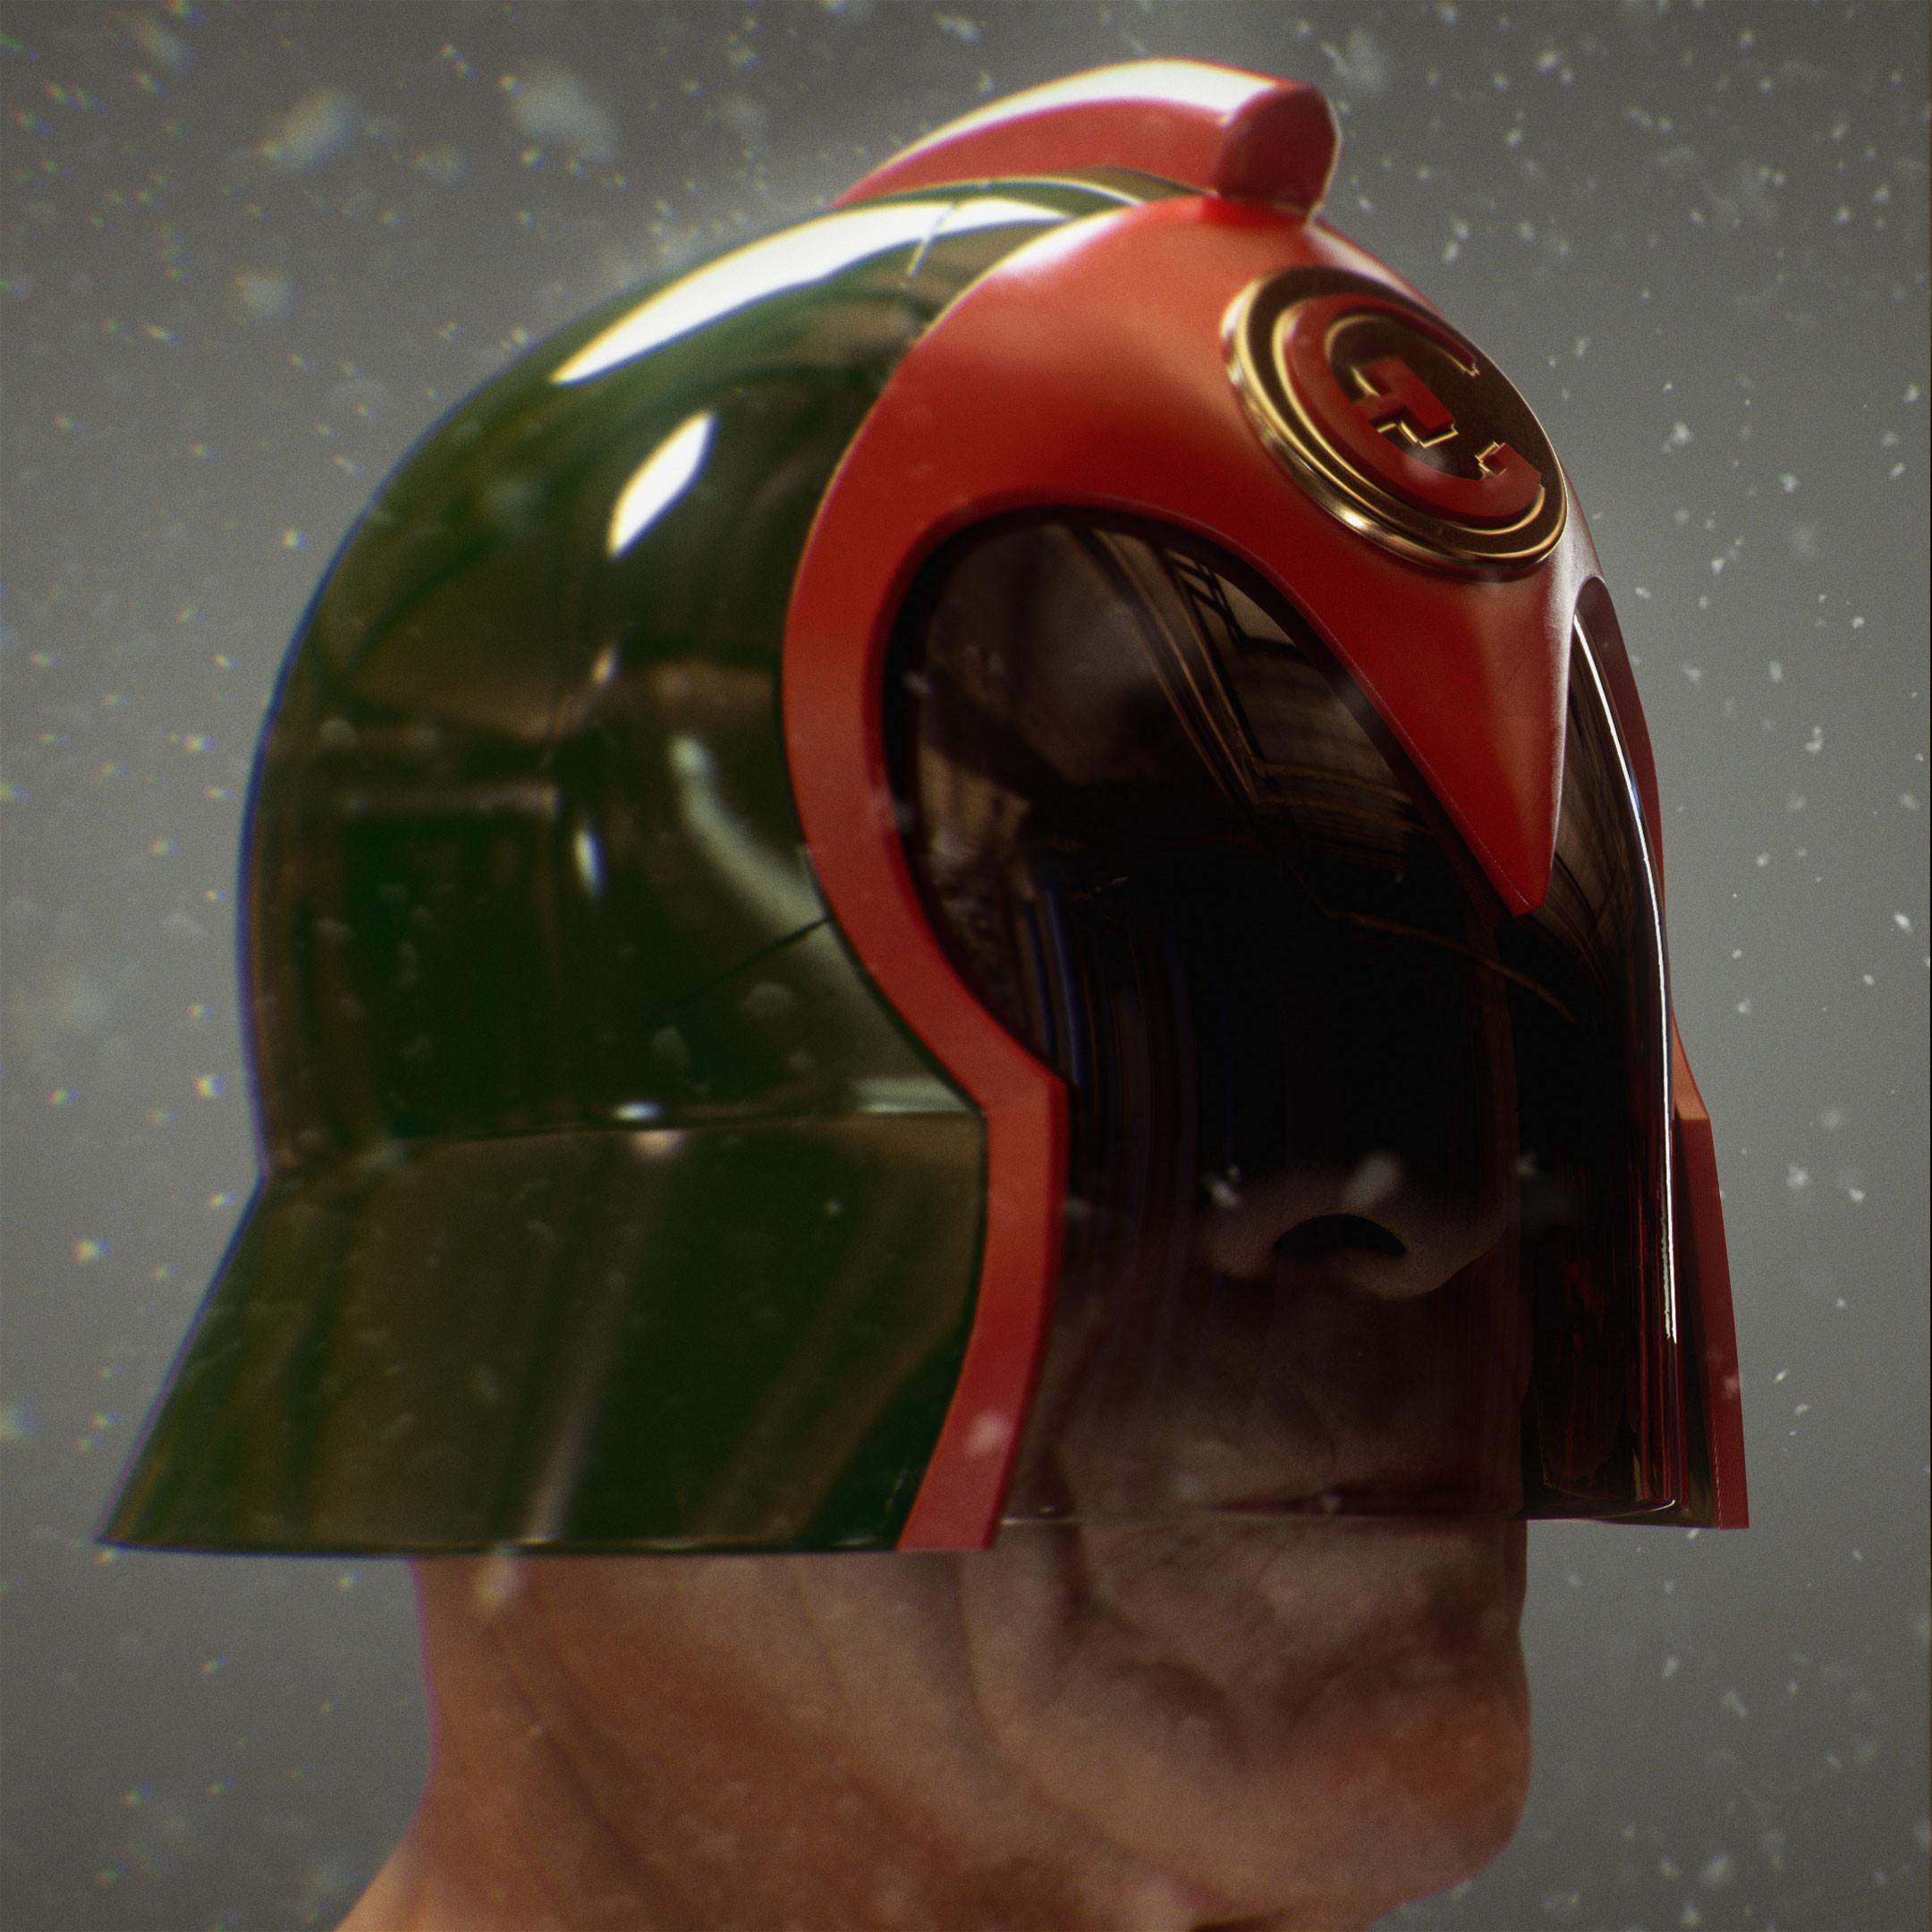 East-Meg One Judge Helmet Based on a design by Brian Bolland (Head sculpt by Ten24)